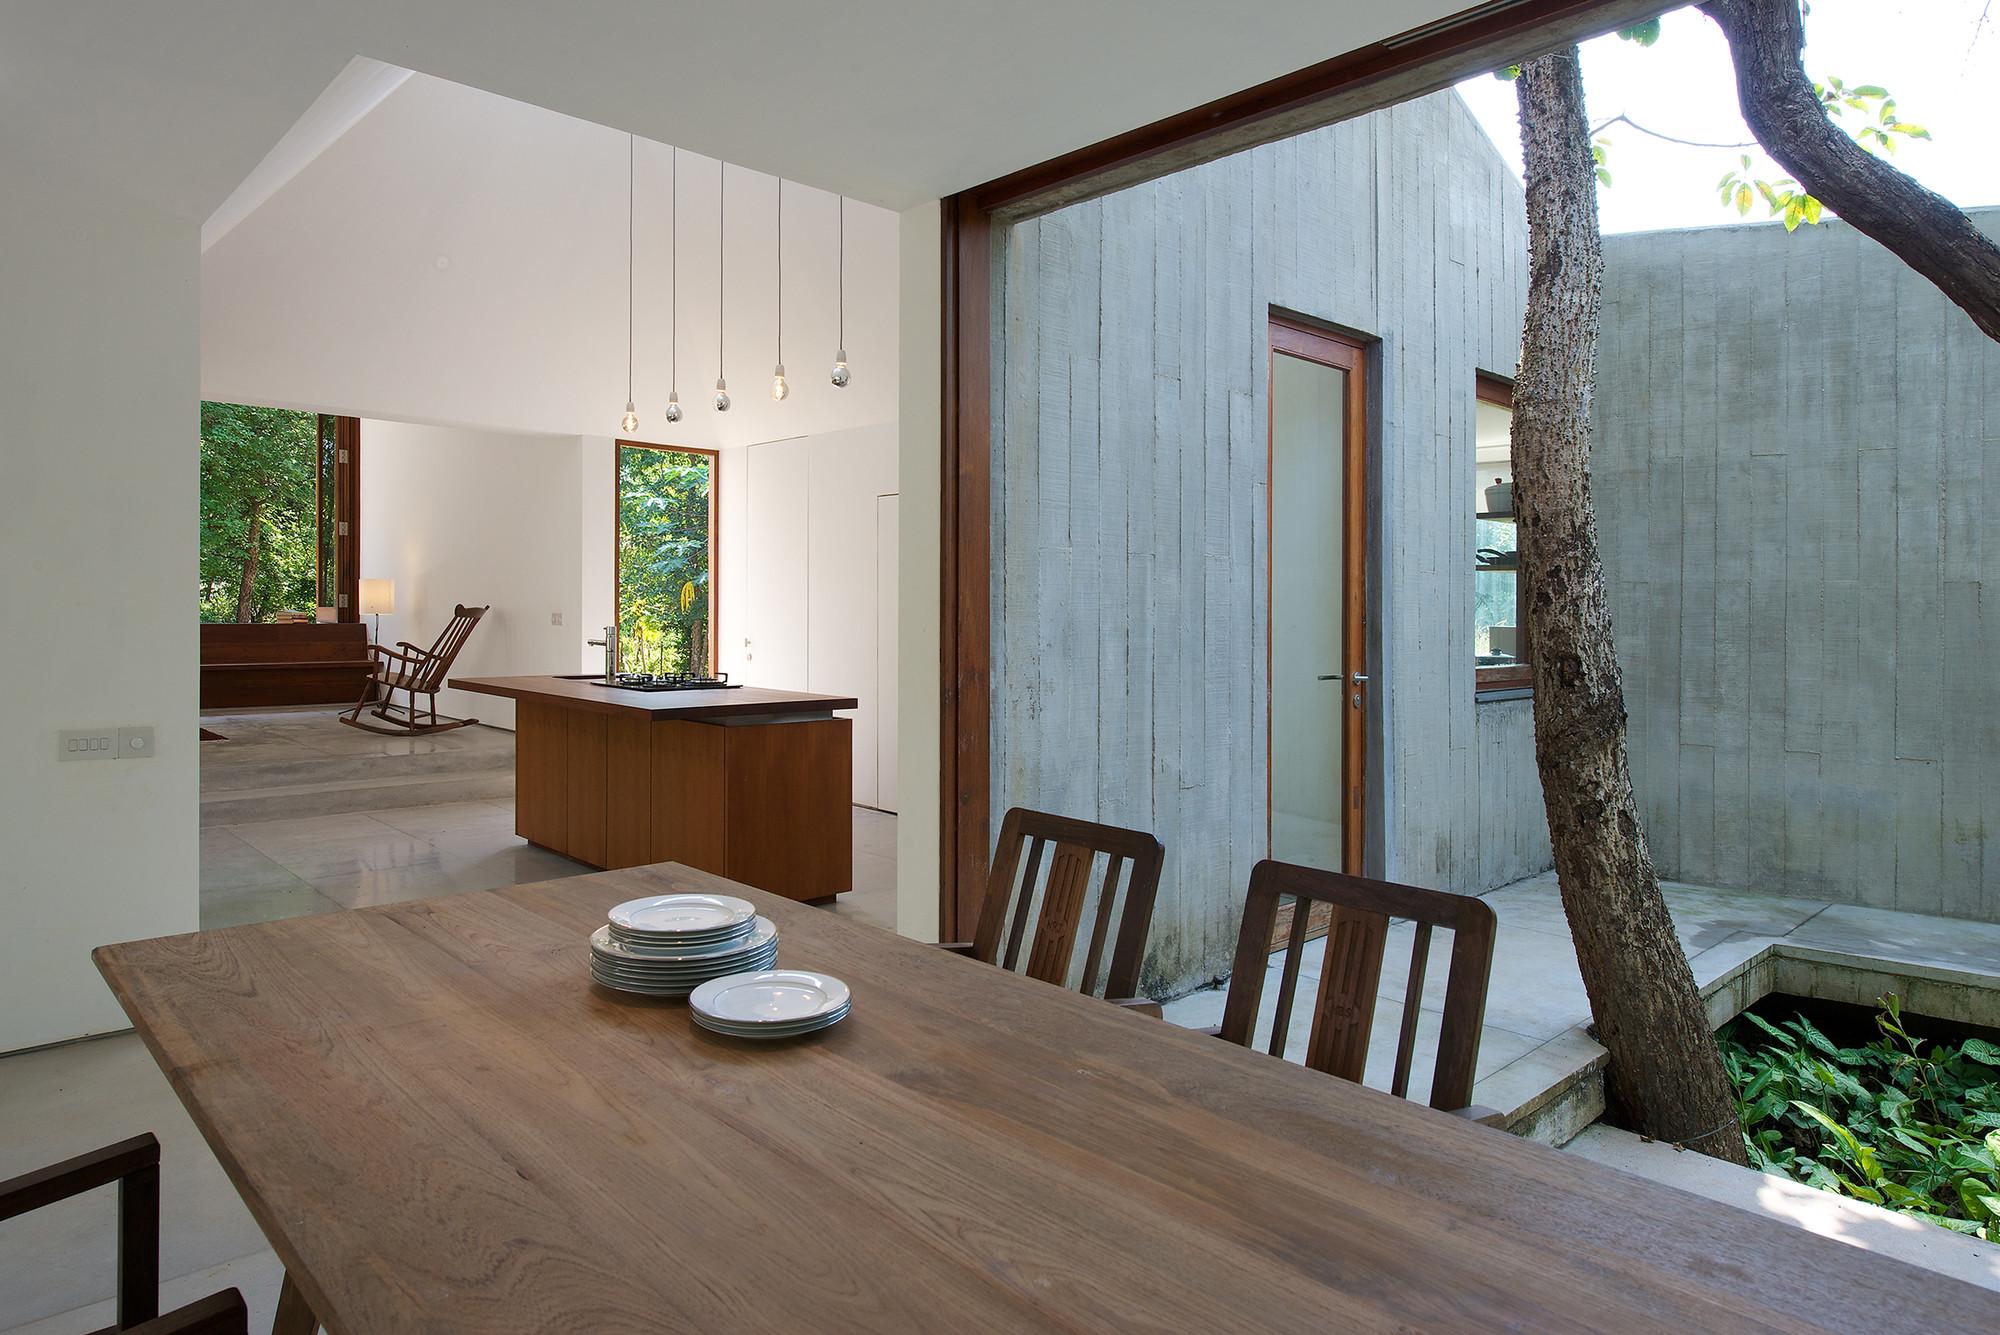 galeria de casa no riacho architecture brio 10. Black Bedroom Furniture Sets. Home Design Ideas